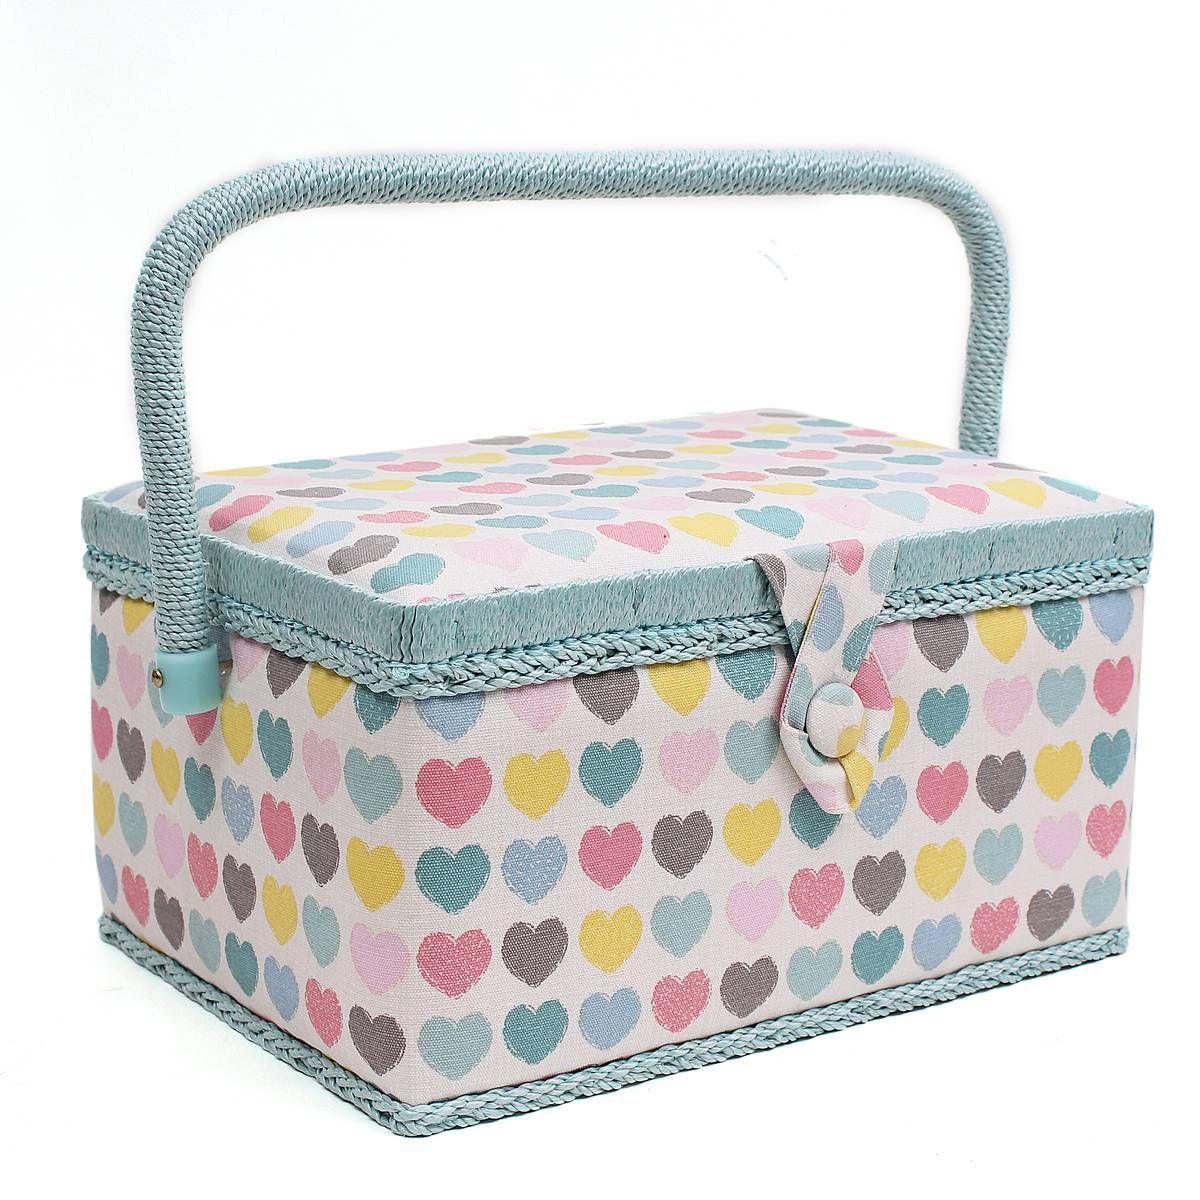 Pastel Hearts Sewing Box 18.5 x 26 x 15 cm   Present ideas ...